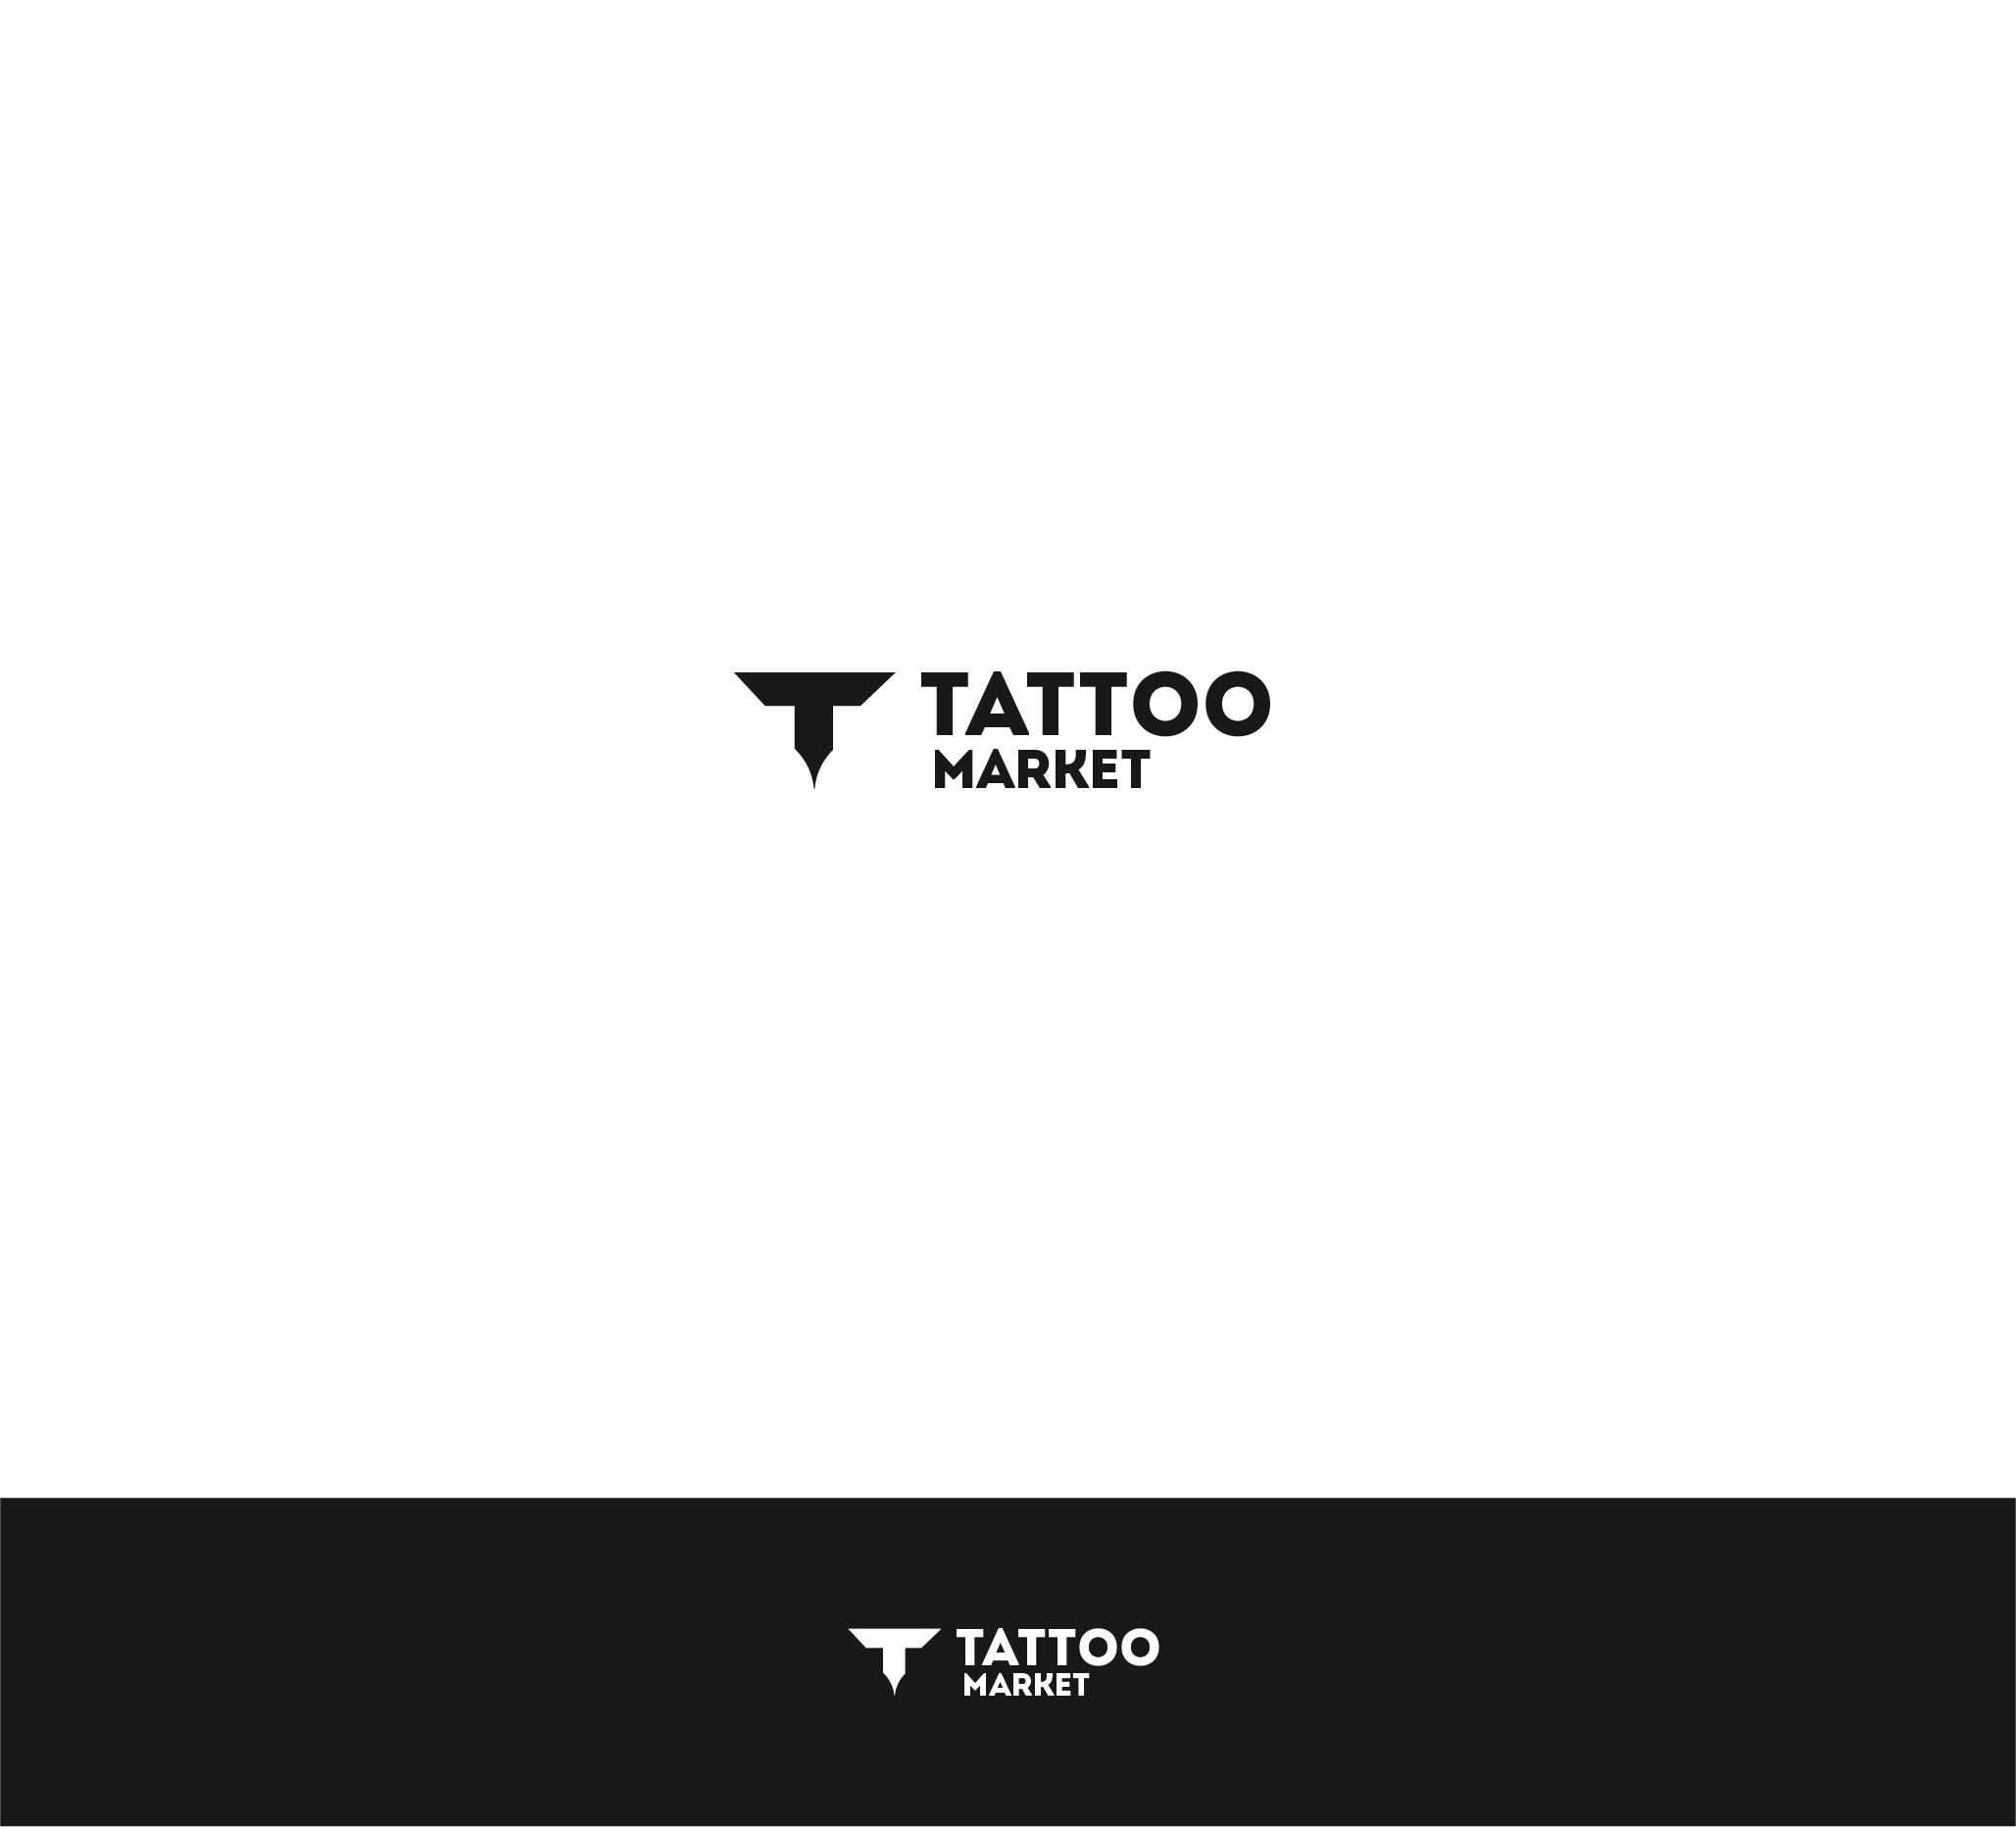 Редизайн логотипа магазина тату оборудования TattooMarket.ru фото f_1105c3af0432d293.jpg